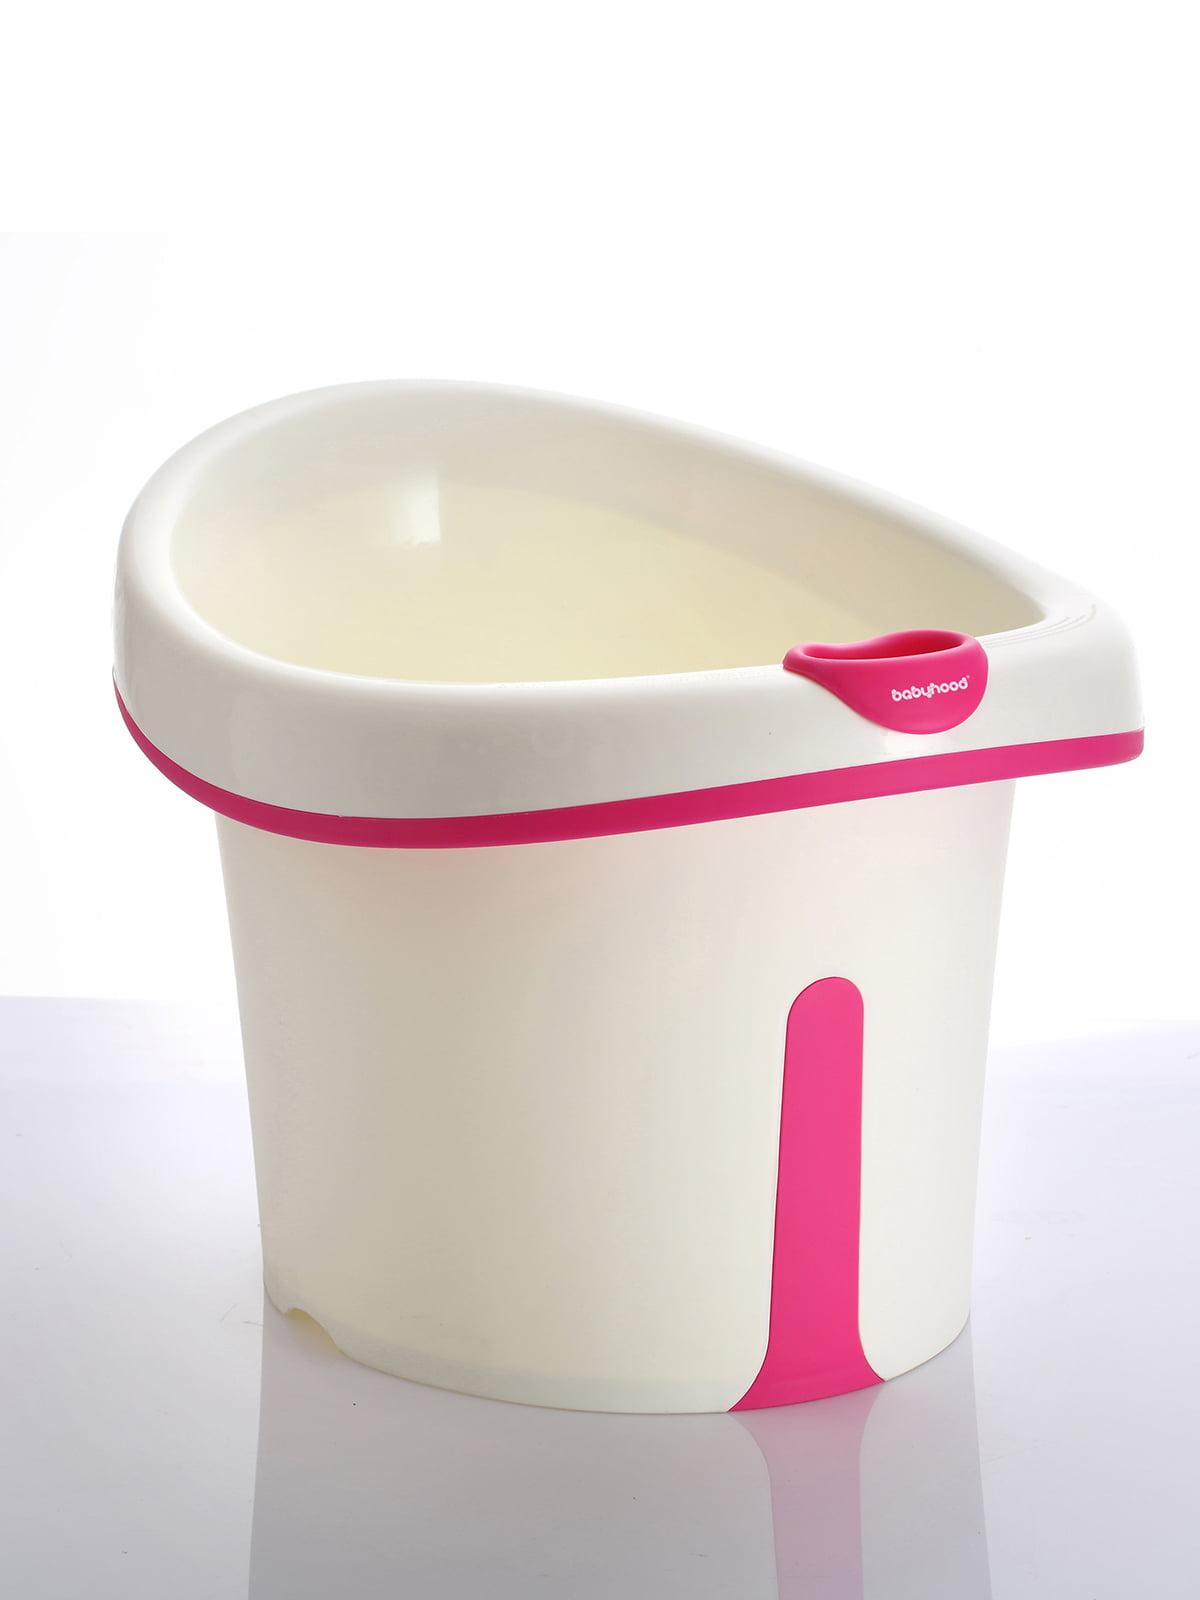 Ванночка для купания BH-304 бело-розовая | 4415581